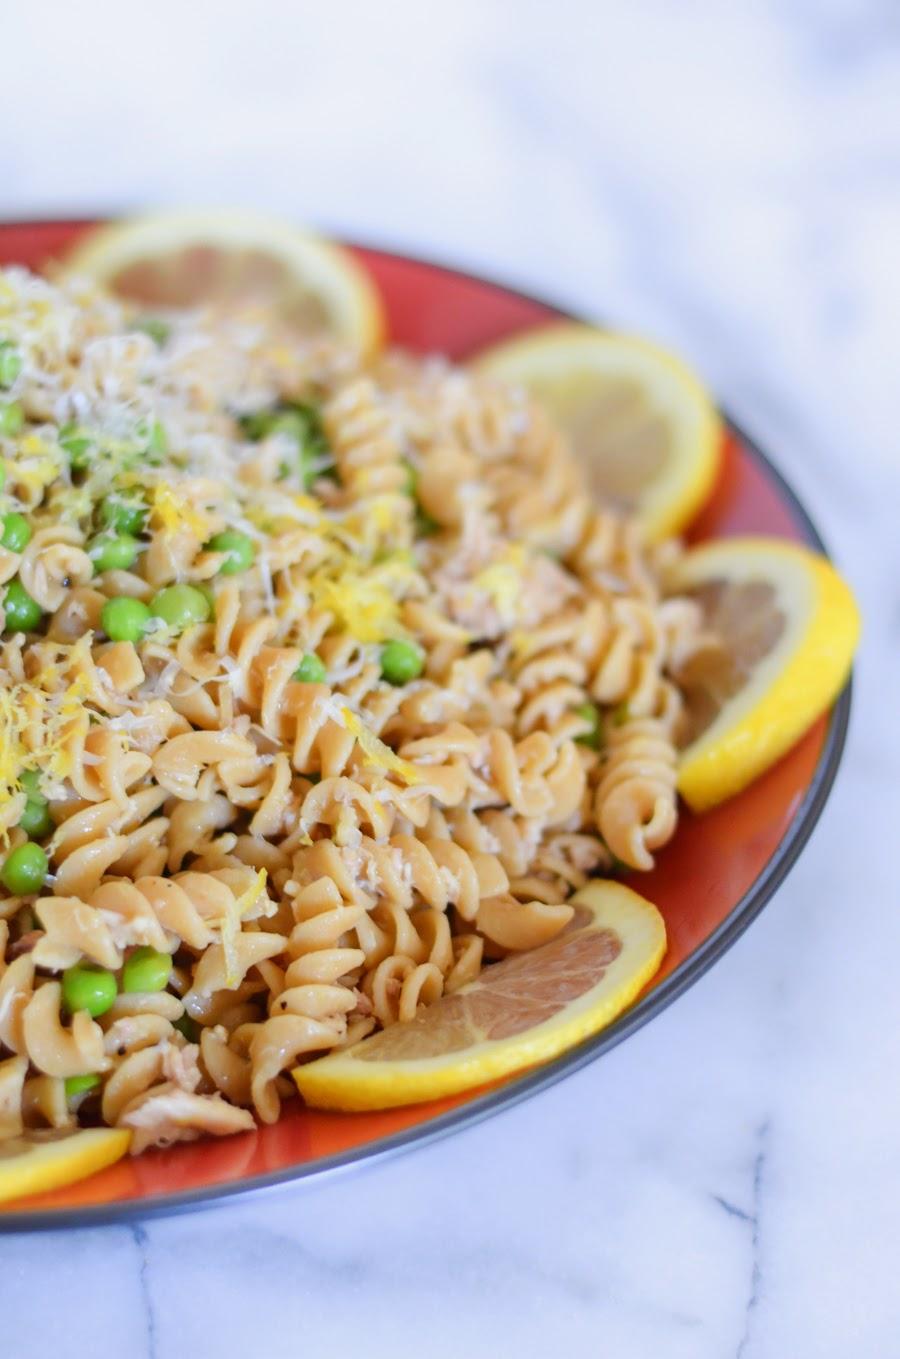 Canned Tuna Recipe | Garlic Lemon Pasta